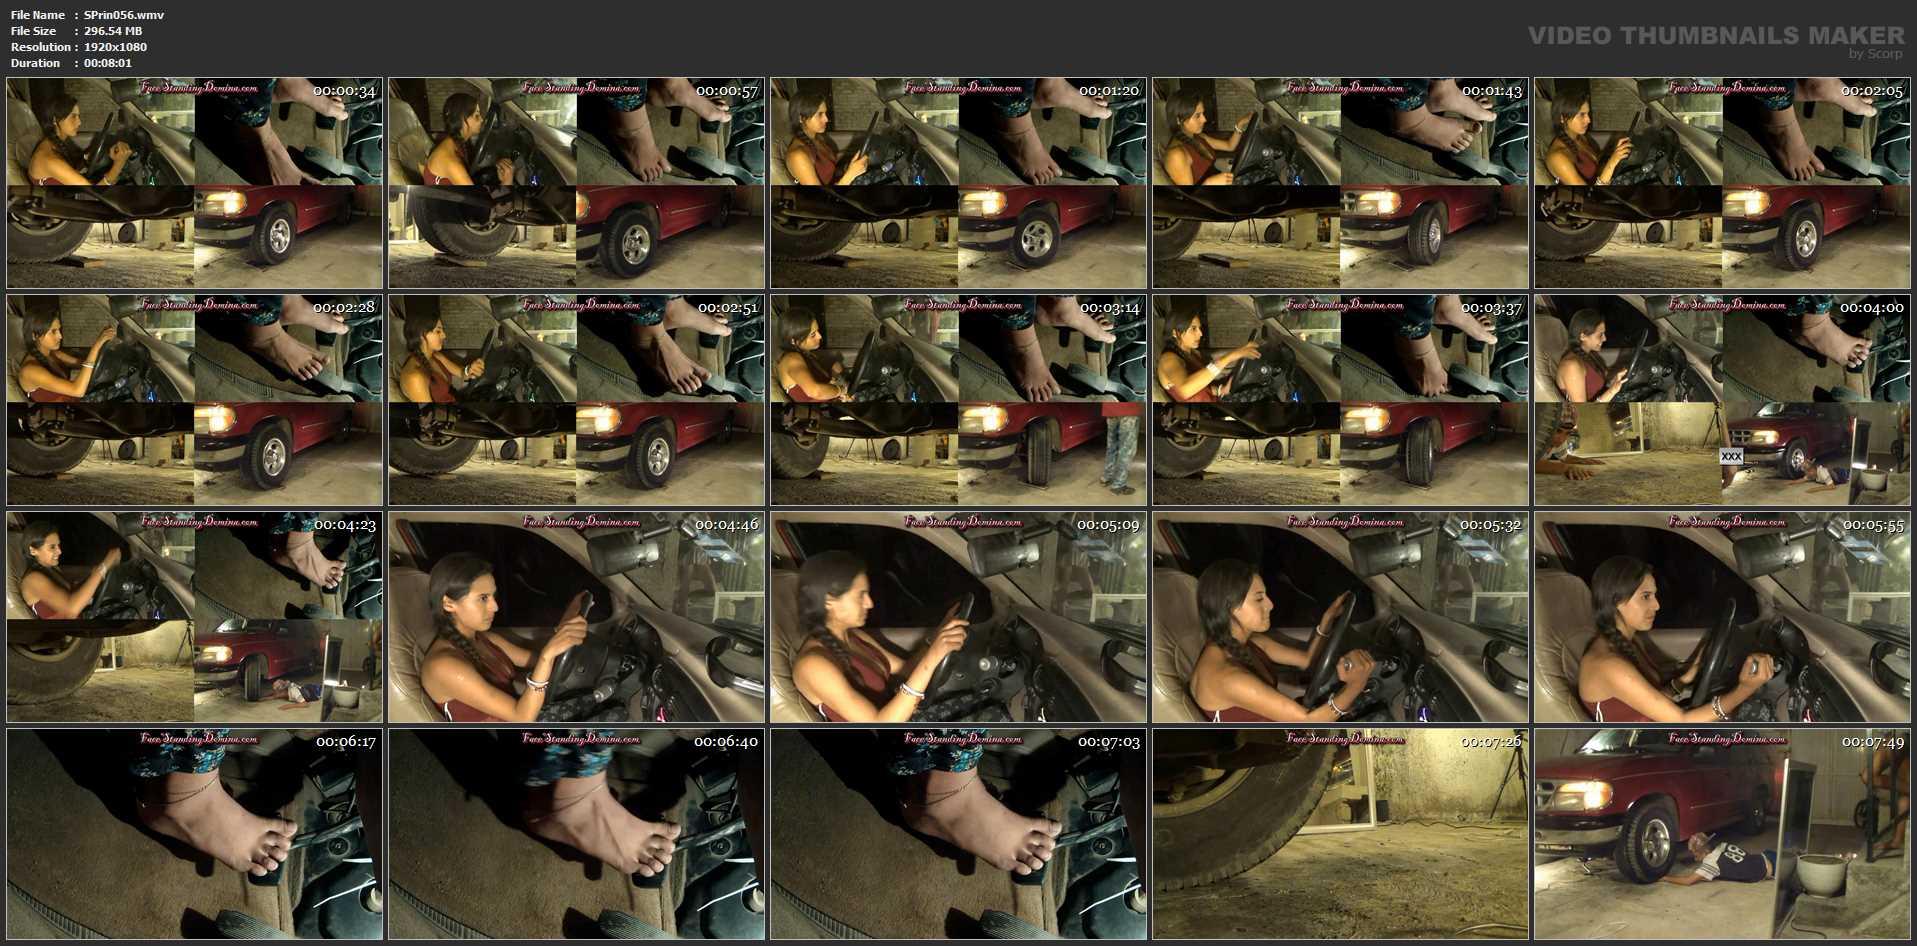 [SCAT-PRINCESS] Sheila Wheeling on His Hand [FULL HD][1080p][WMV]